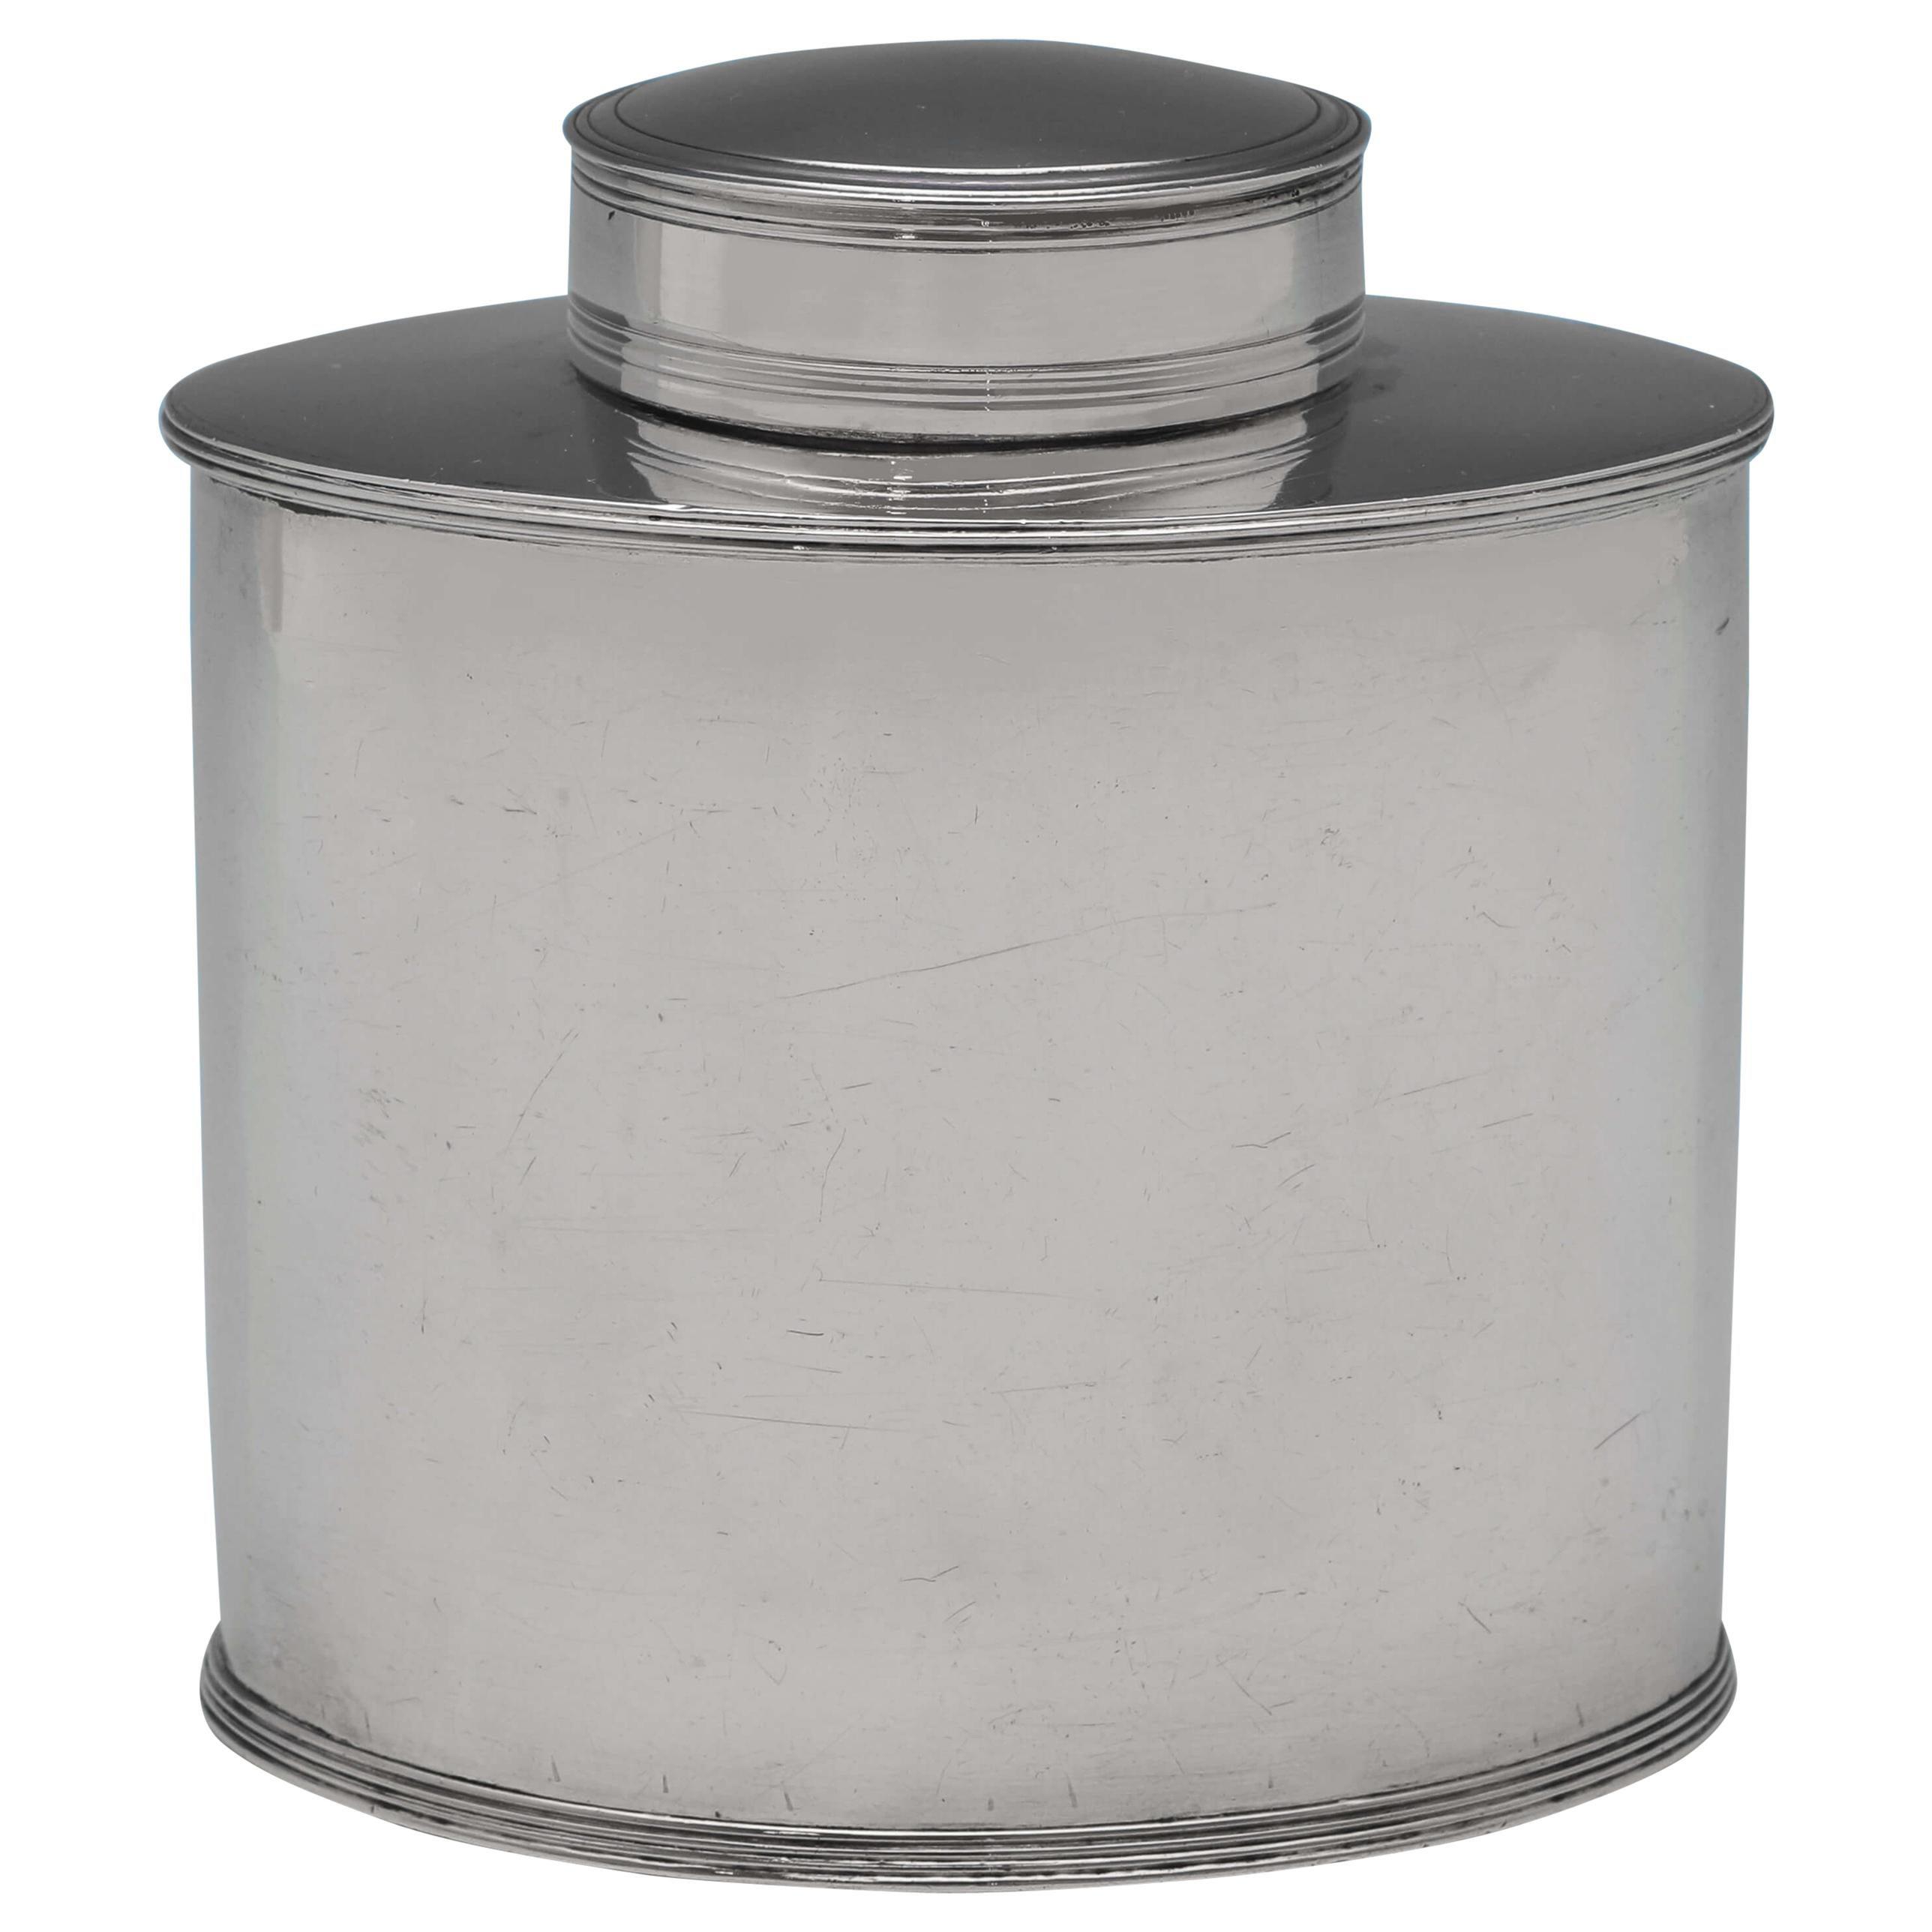 Hester Bateman, Sterling Silver Tea Caddy, London 1788, Oval Shape